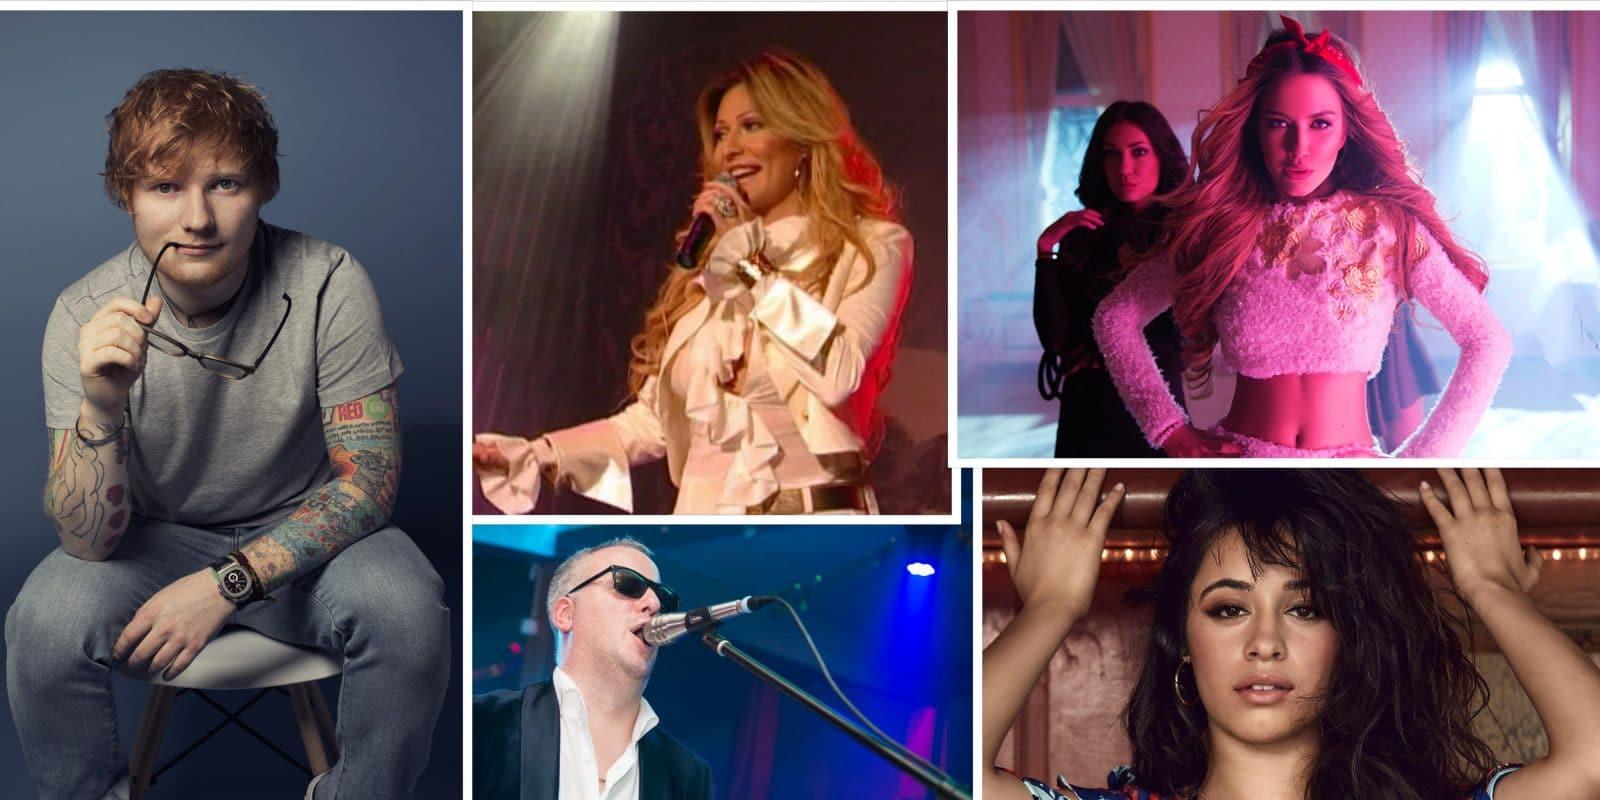 Andrea Montenegro En Latin Lover balkan music fans cling to homegrown stars | balkan insight